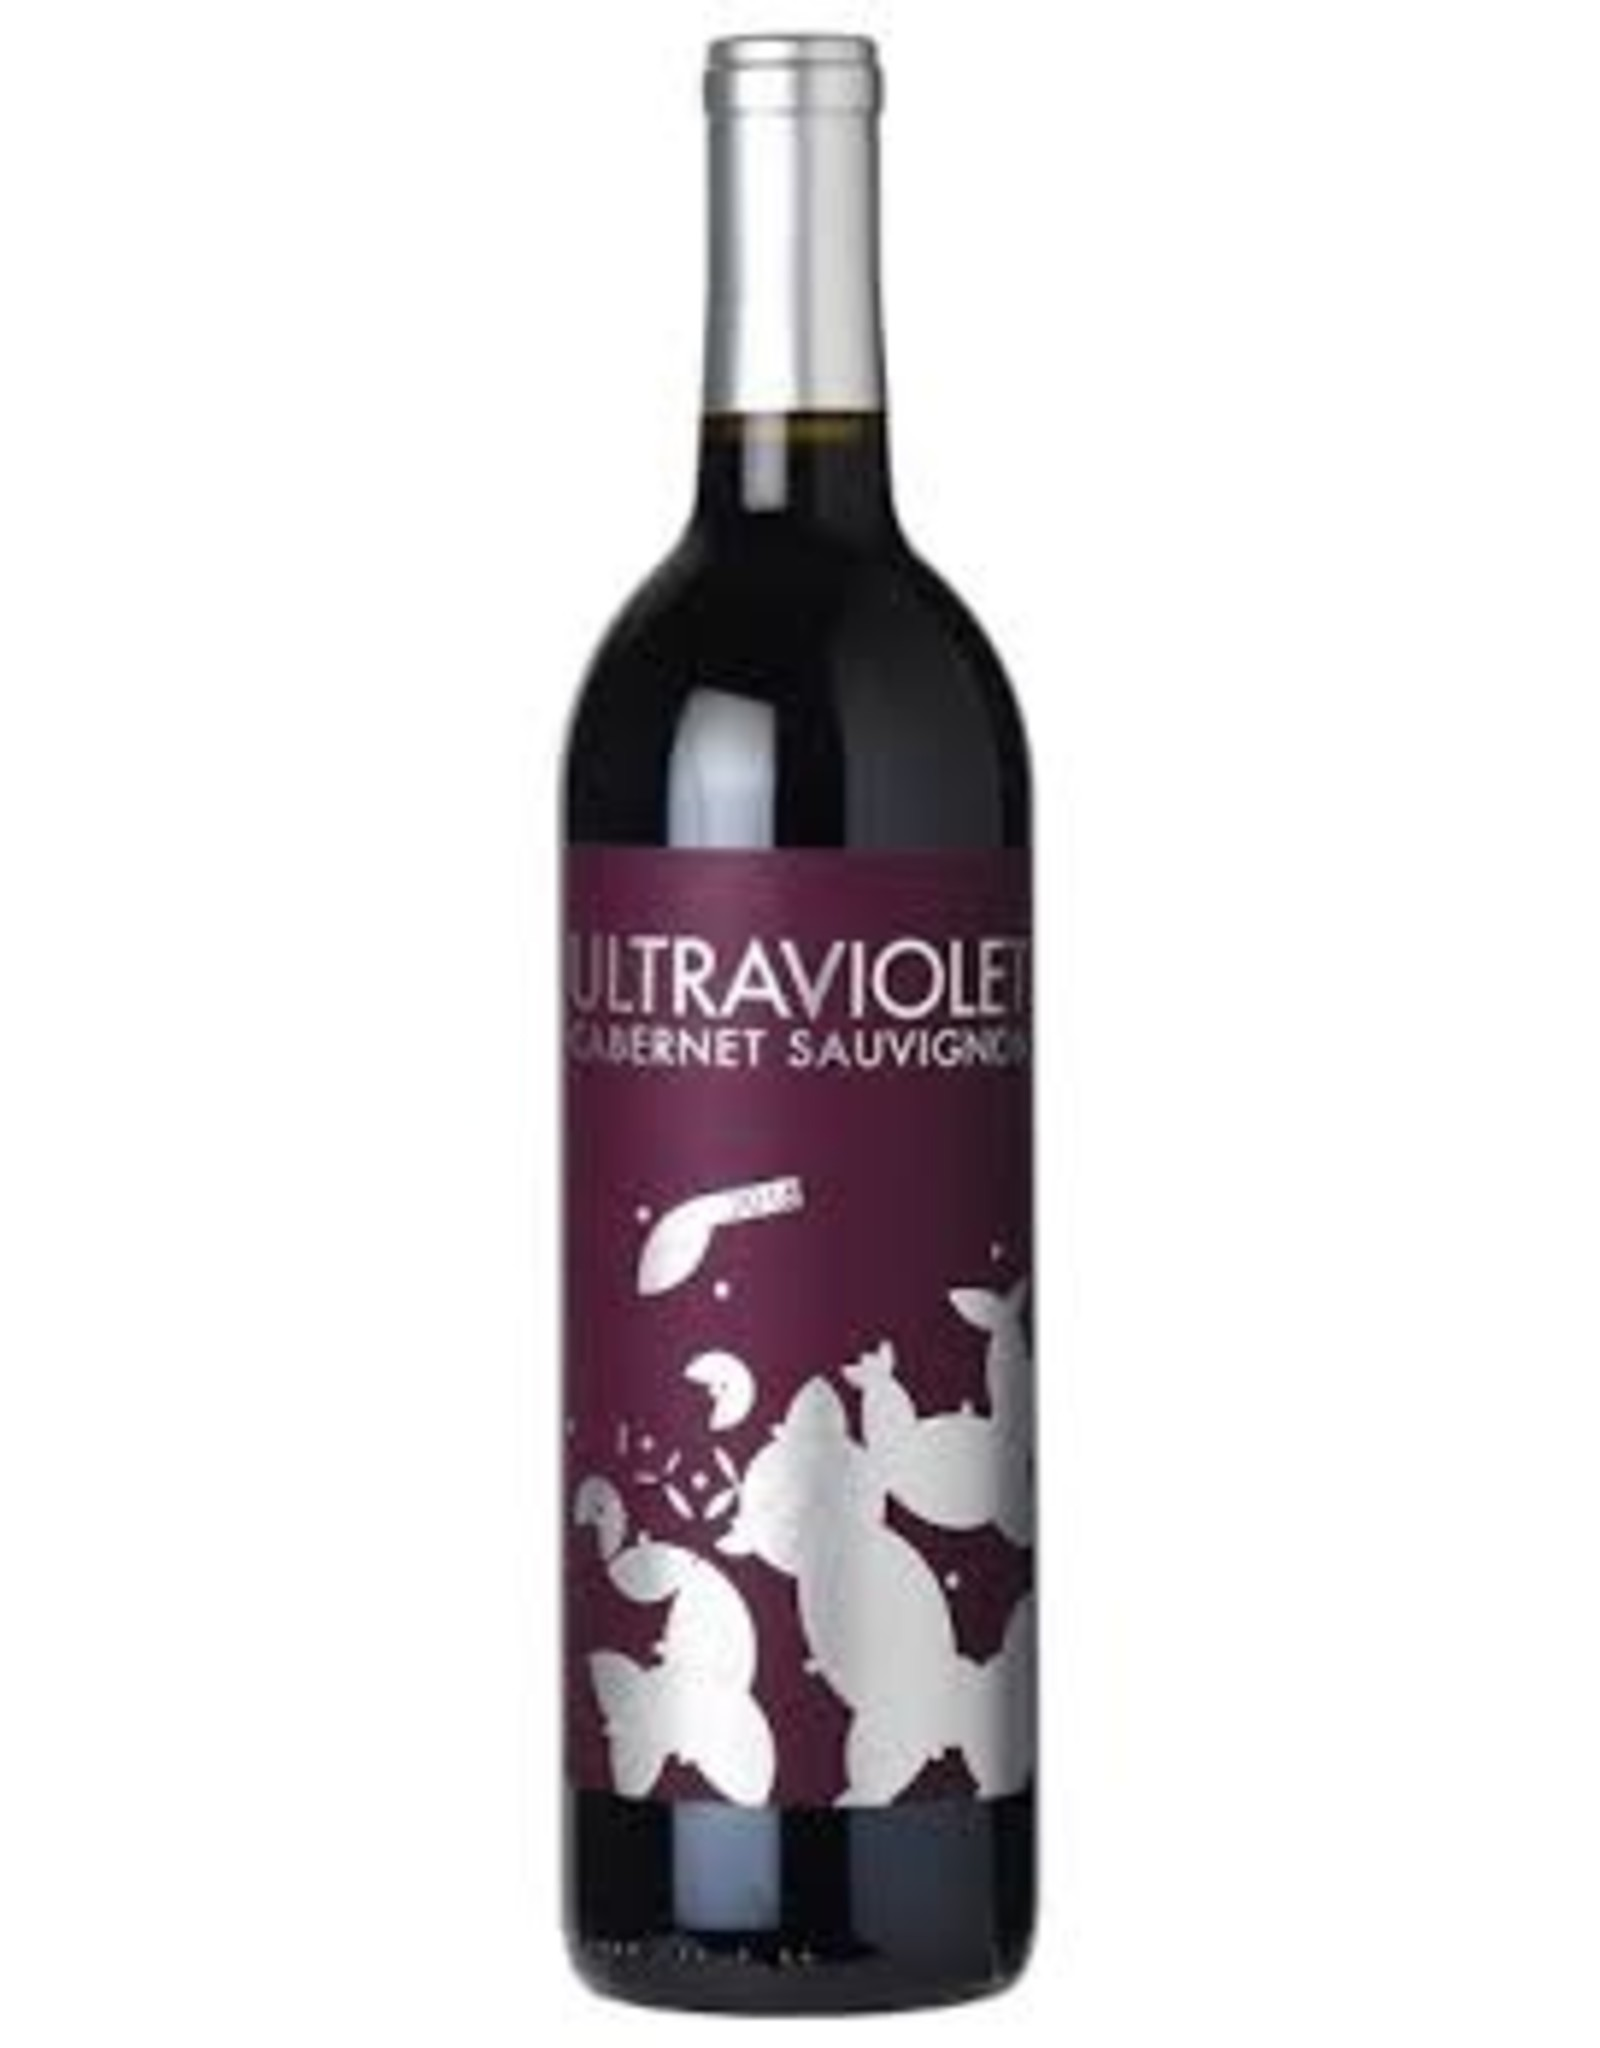 Ultraviolet Cabernet Sauvignon